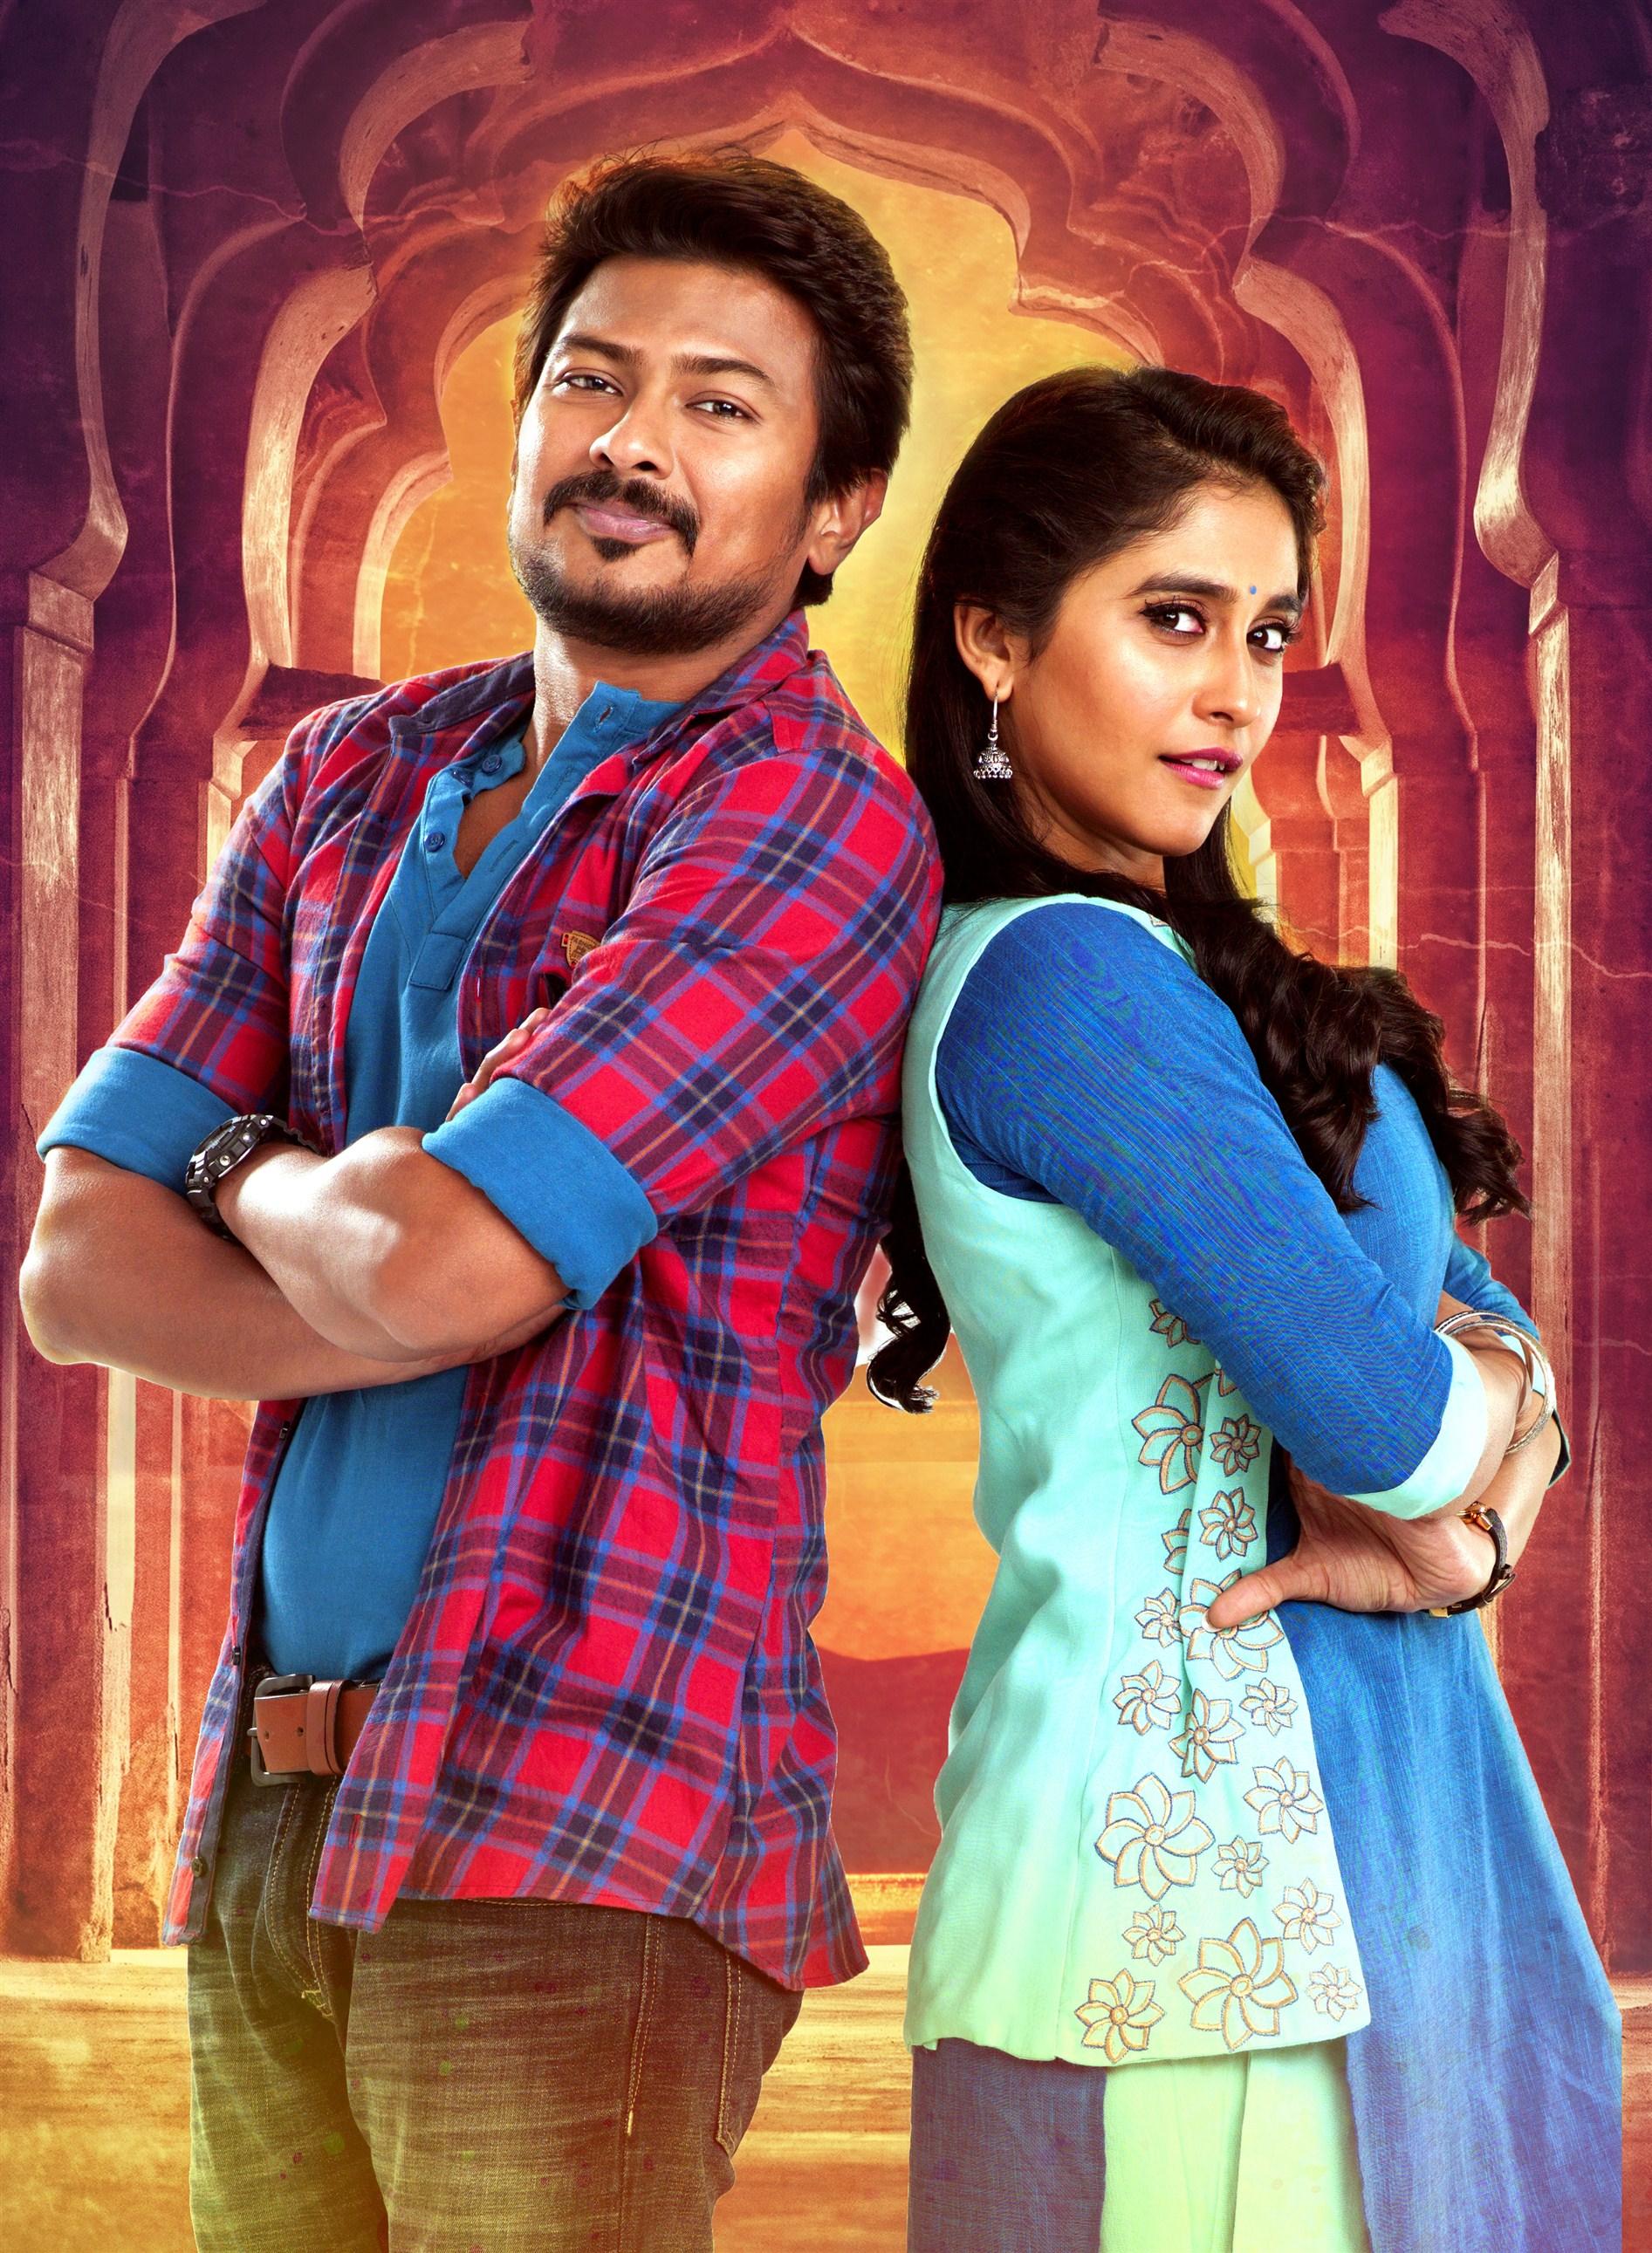 saravanan irukka bayamaen (2017) full movie